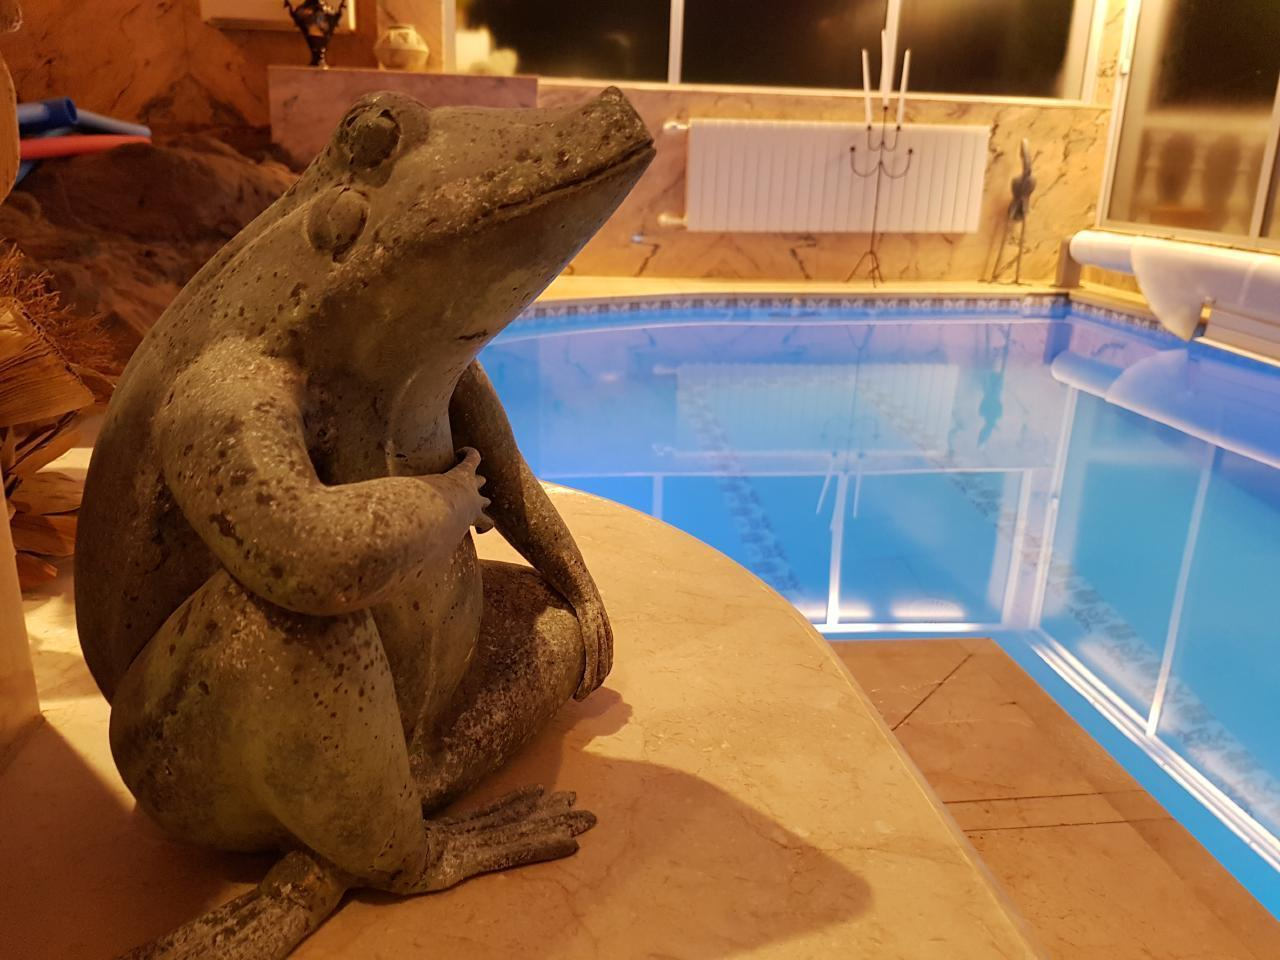 Appartement de vacances Villa Larnia Familien Apartment   * Urlaub für Körper, Geist und Seele * (2529406), El Sauzal, Ténérife, Iles Canaries, Espagne, image 8